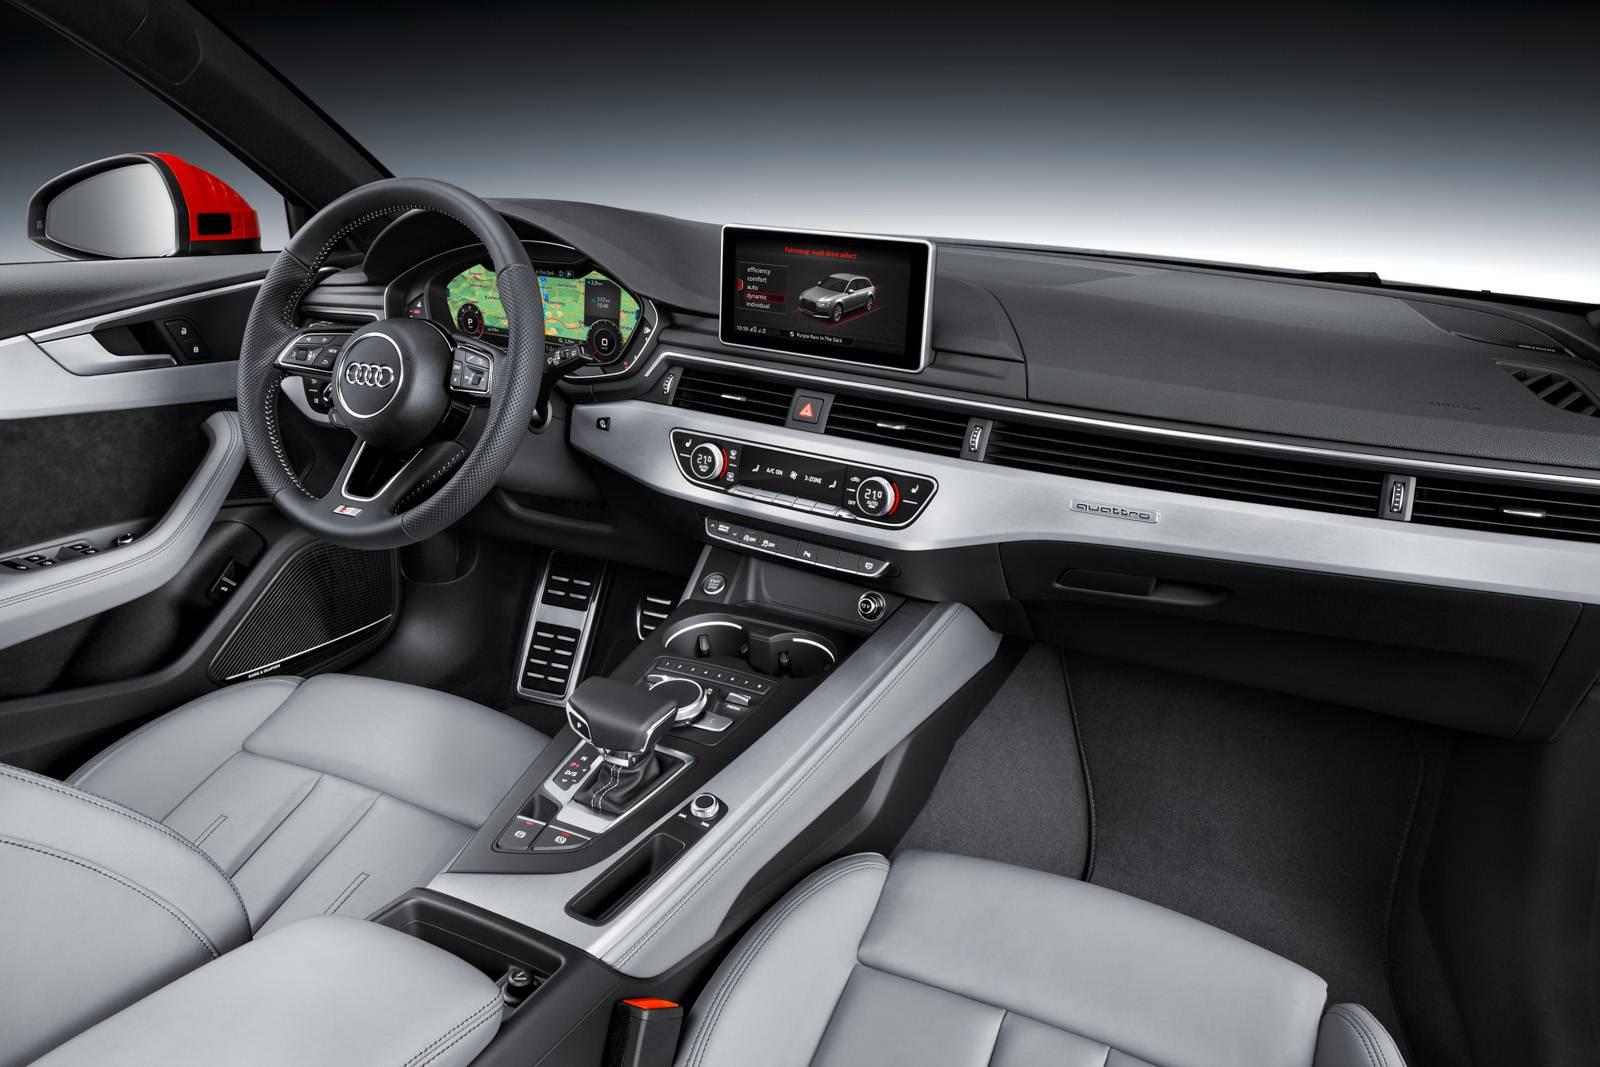 2016 Audi A4 Avant Review - GTspirit